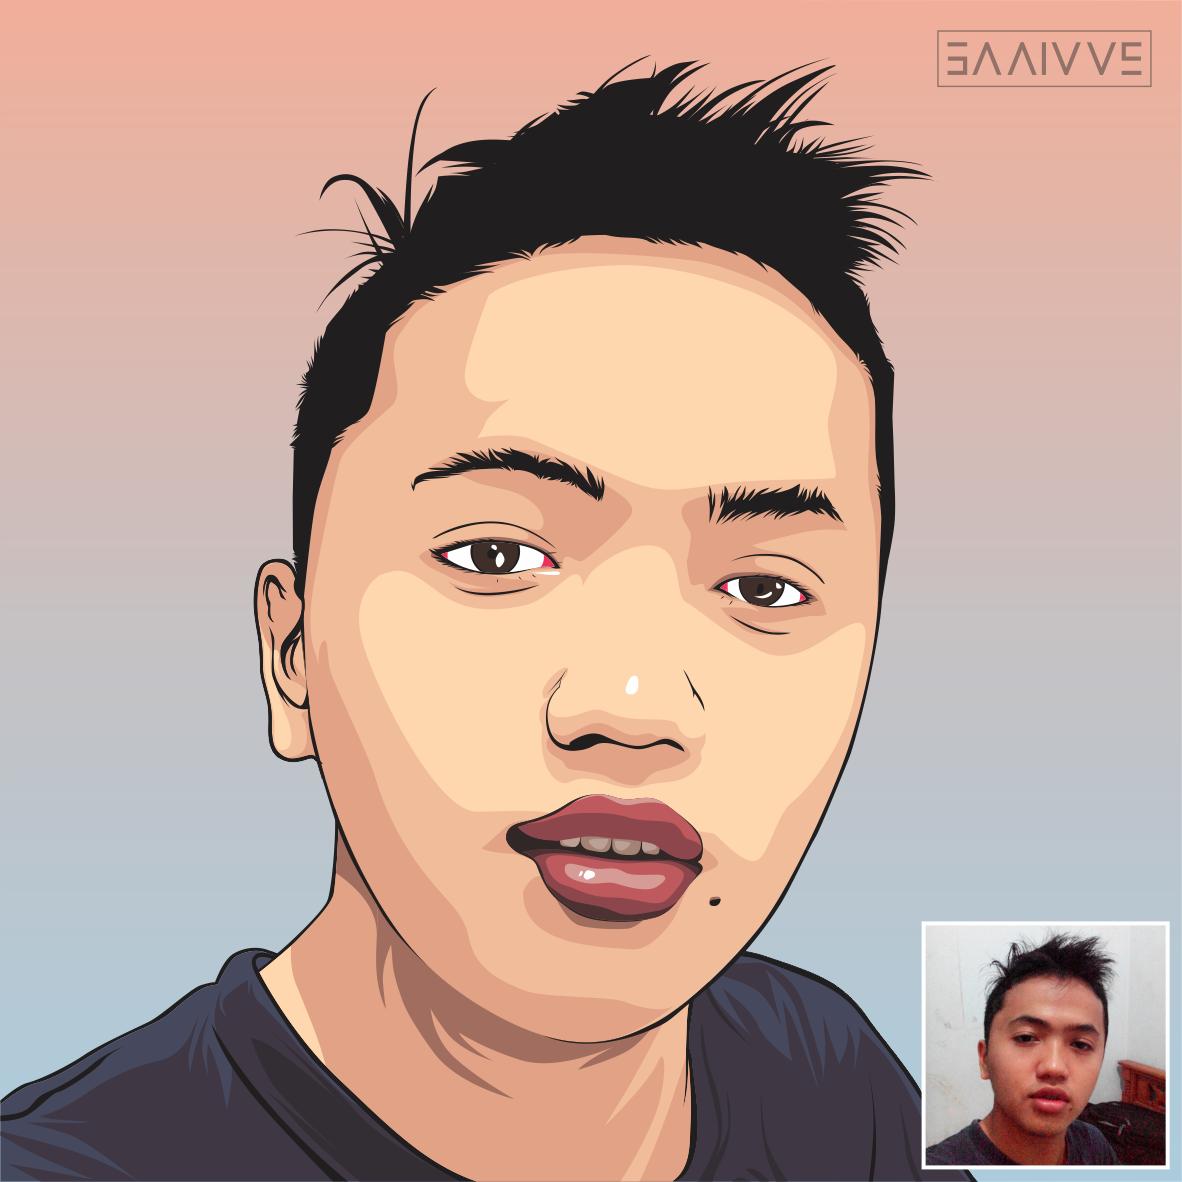 Line Art Wajah : Jasa order vektor wajah kartun artlistious